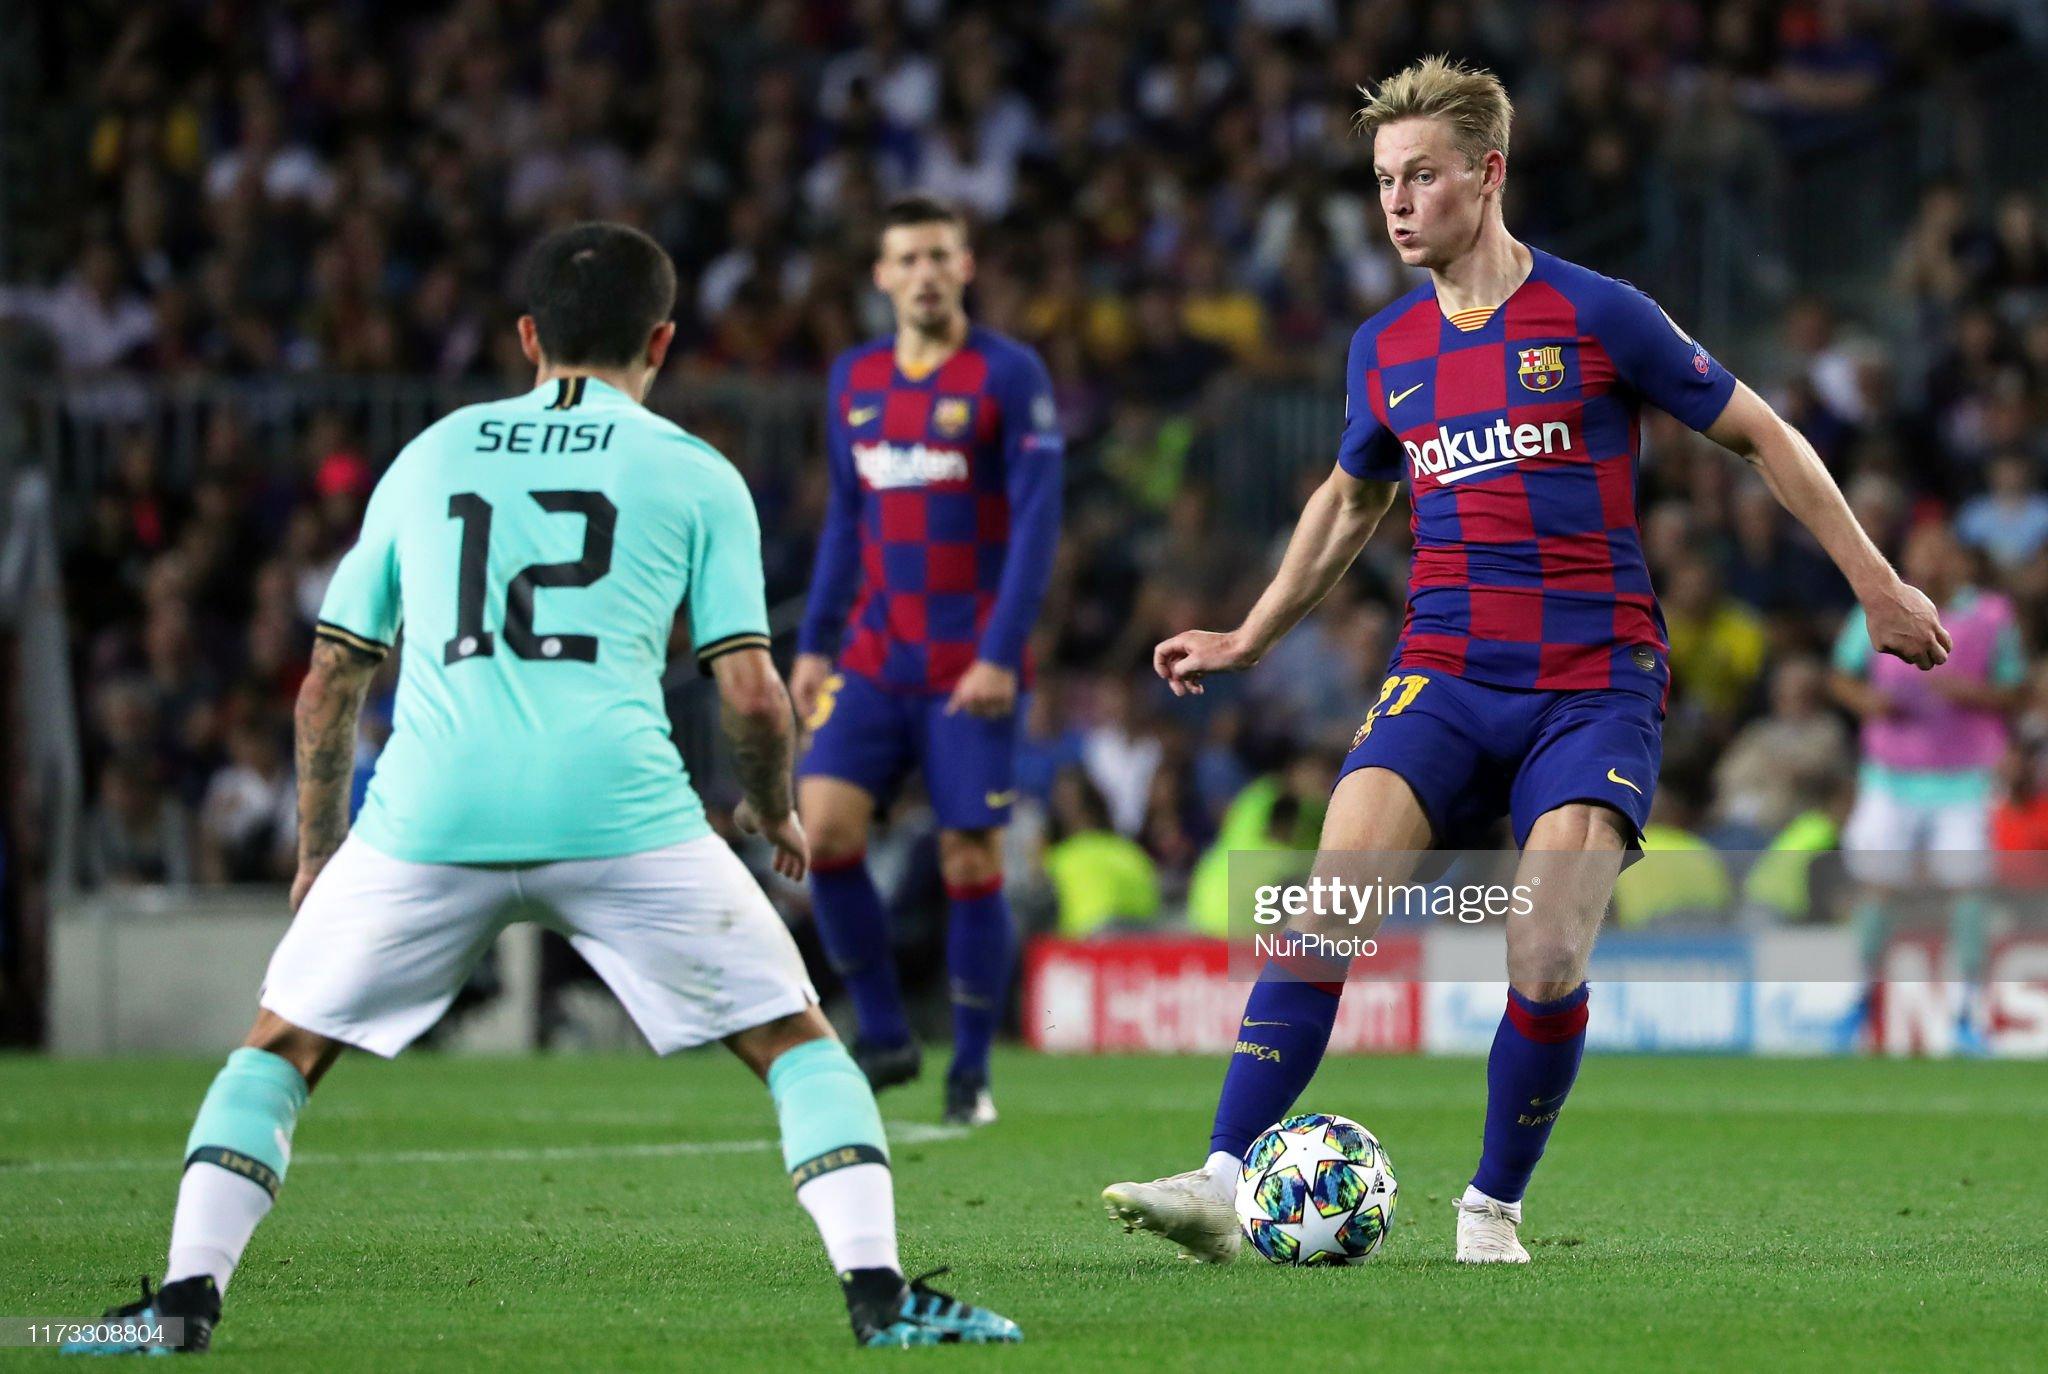 صور مباراة : برشلونة - إنتر 2-1 ( 02-10-2019 )  Frenkie-de-jong-during-the-match-between-fc-barcelona-between-inter-picture-id1173308804?s=2048x2048